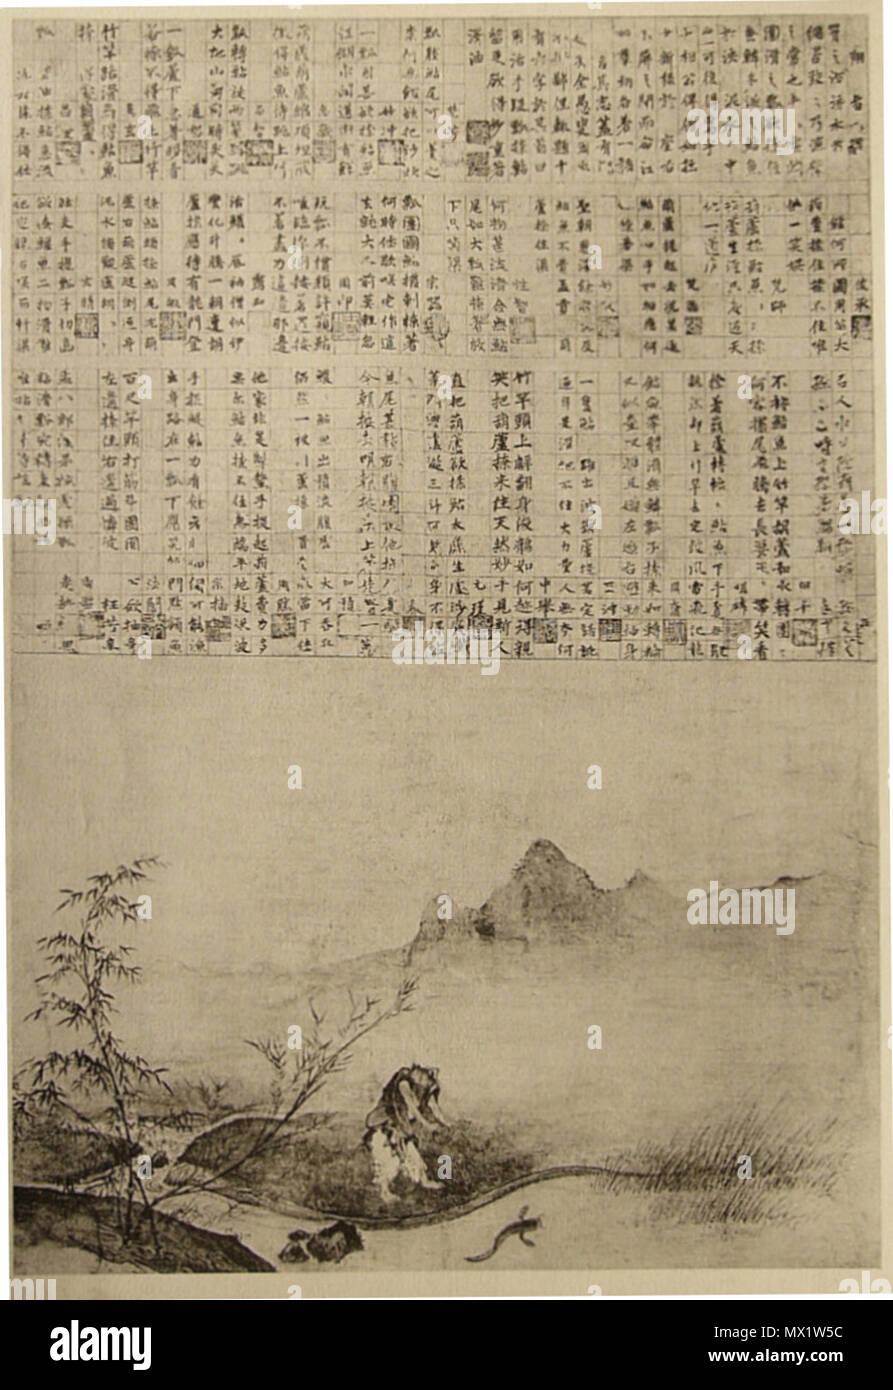 . English: Hyonen zu by Josetsu, painter from the Muromachi period, ca 1415, ink on paper, 111.5cm height, 75.8cm wide, Taizo-in, Myoshin-ji, Kyoto, Japan 日本語: 瓢鯰図、如拙、紙本水墨 111.5cm x75.8cm 京都 妙心寺、室町時代1415年ごろ . about ACE1415. Jyosetsu 290 Hyonen zu by Josetsu0 - Stock Image